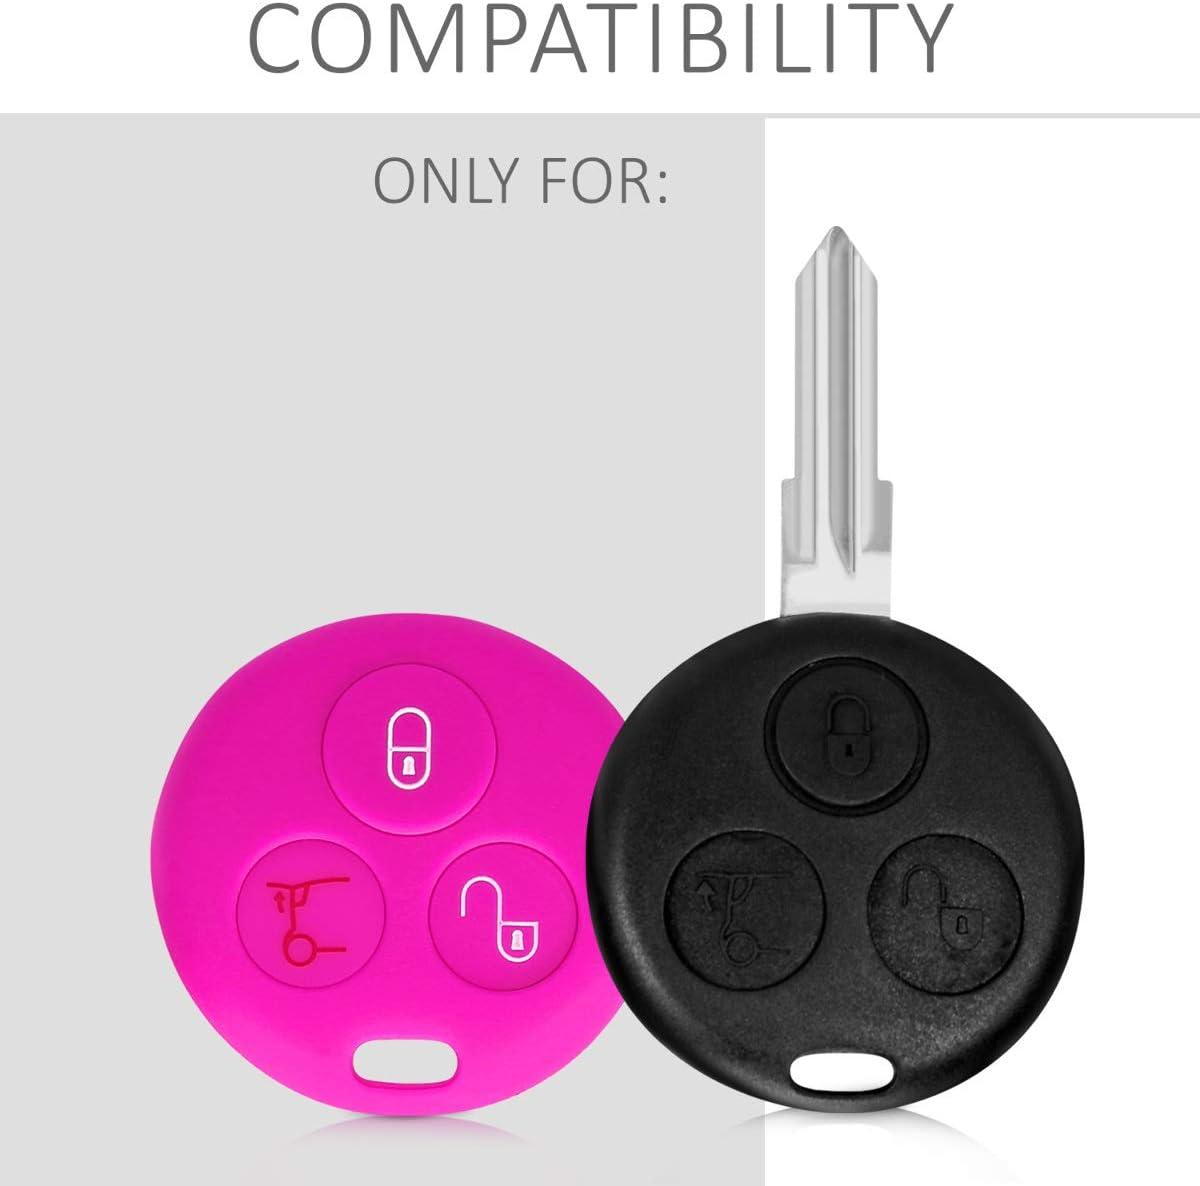 Silikon Schutzh/ülle Schl/üsselh/ülle Cover in Pink kwmobile Autoschl/üssel H/ülle kompatibel mit Smart 3-Tasten Funk Autoschl/üssel